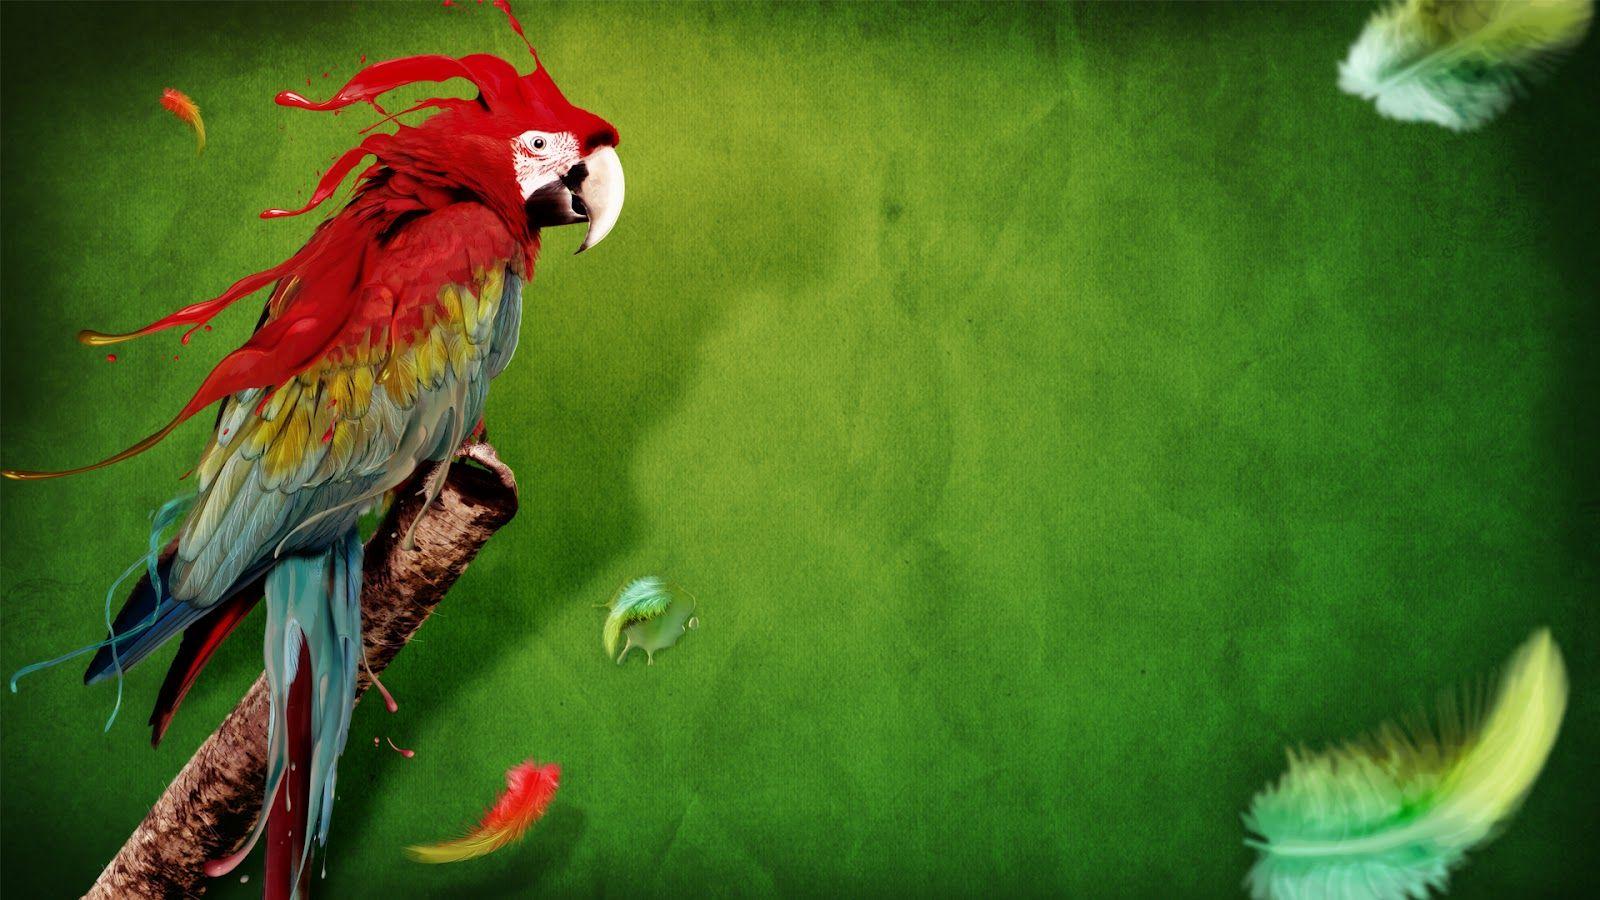 Parrot Colors Abstract Digital Art HD Wallpapers Free Desktop